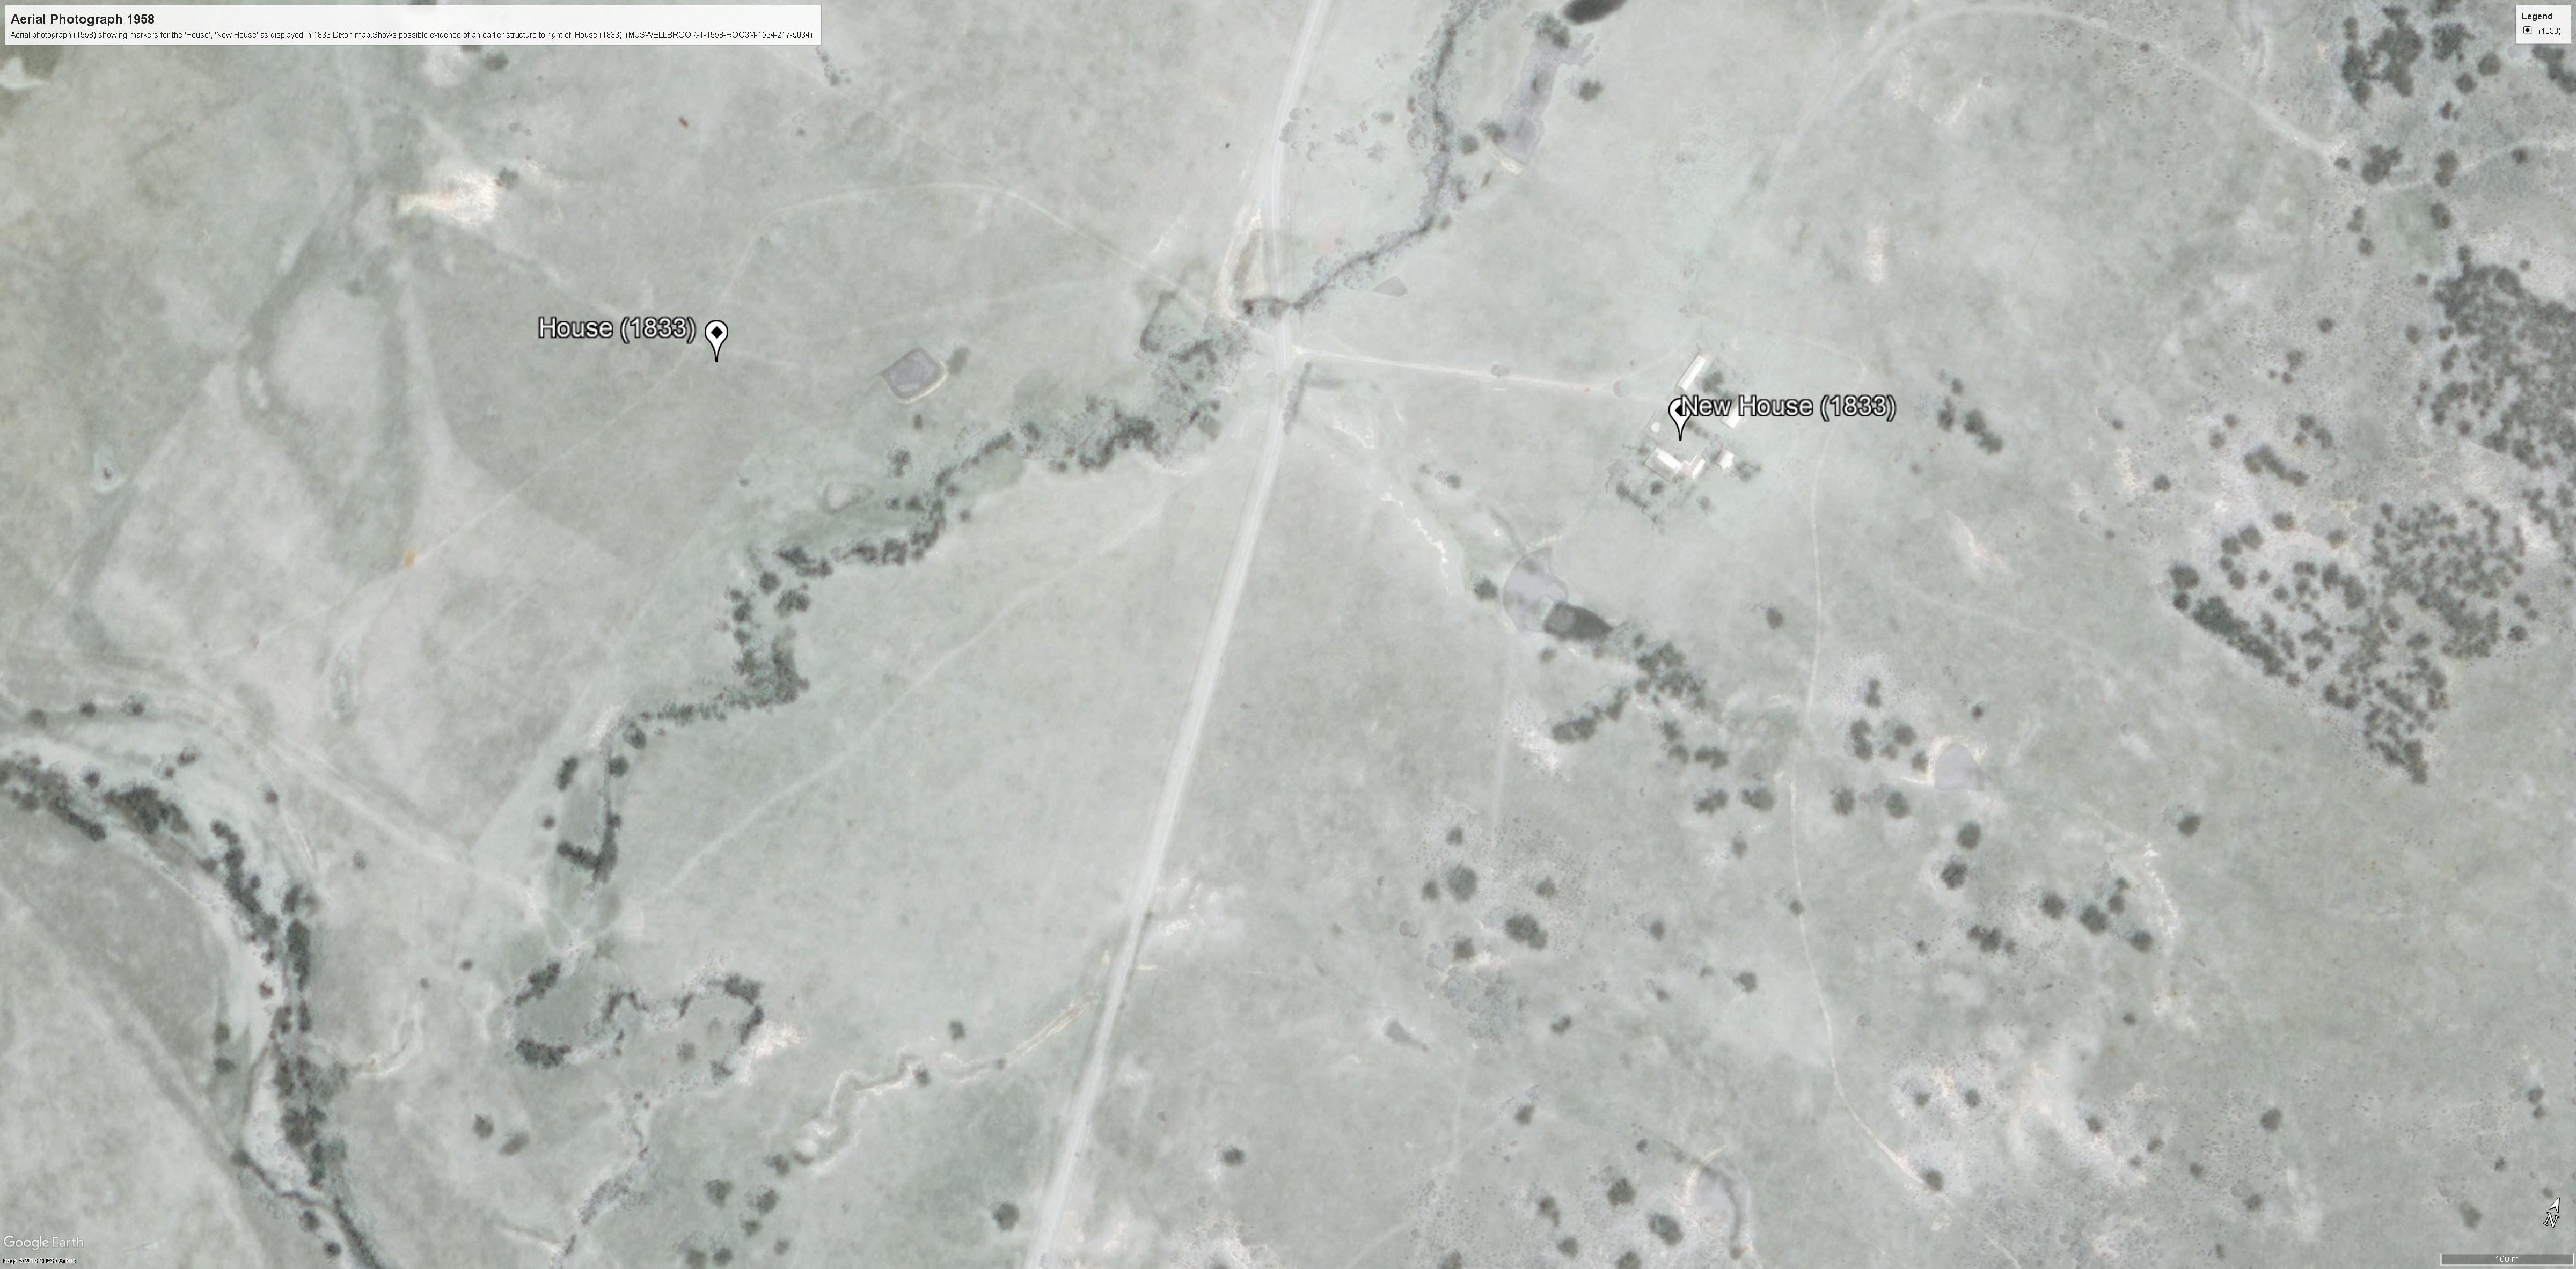 Aerial photo 1958 (MUSWELLBROOK-11-1958-R003-1594-217-5034 )- evidence earlier house